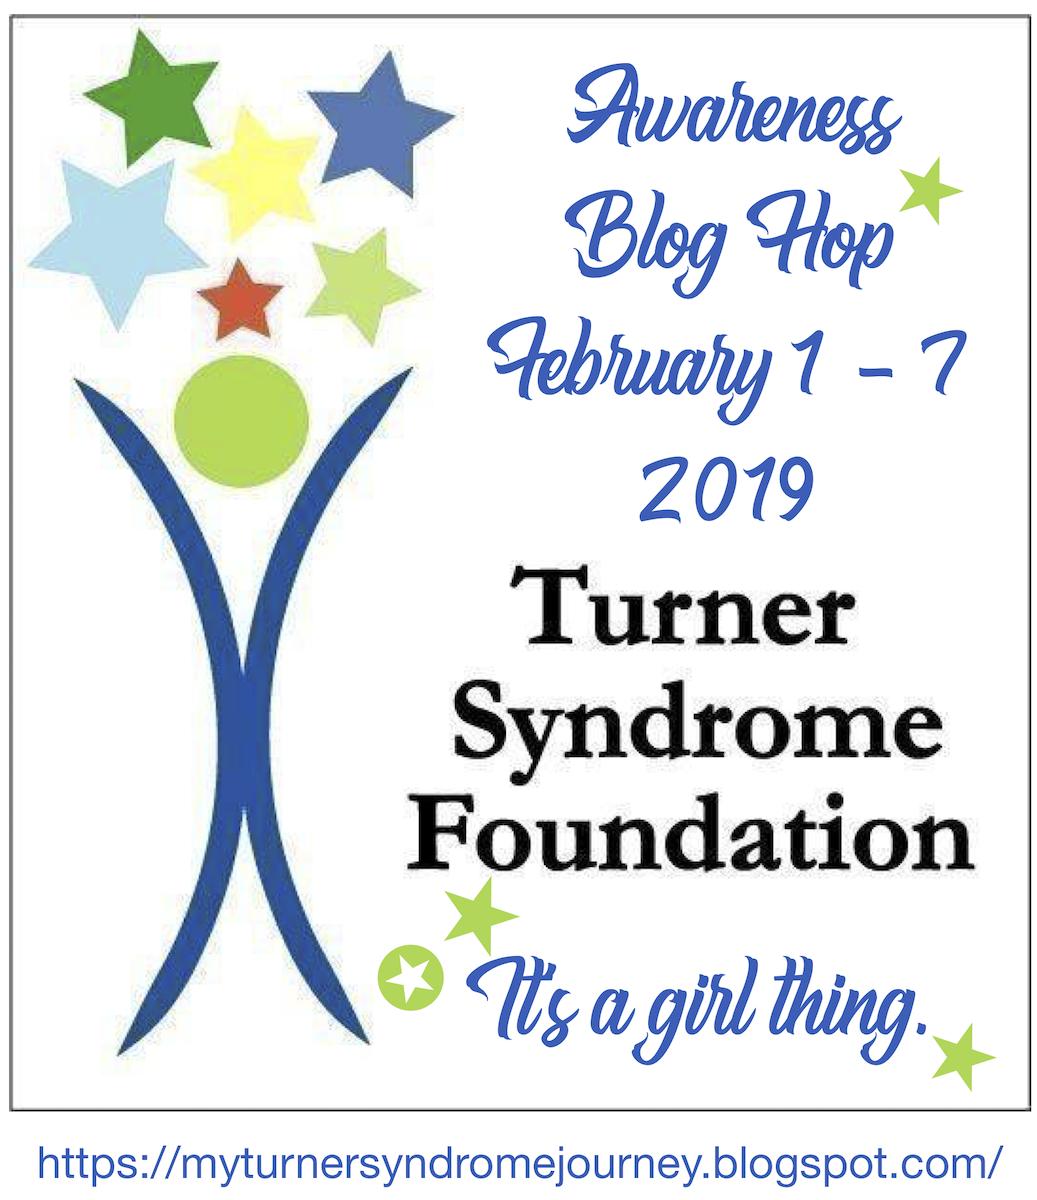 Turner badge